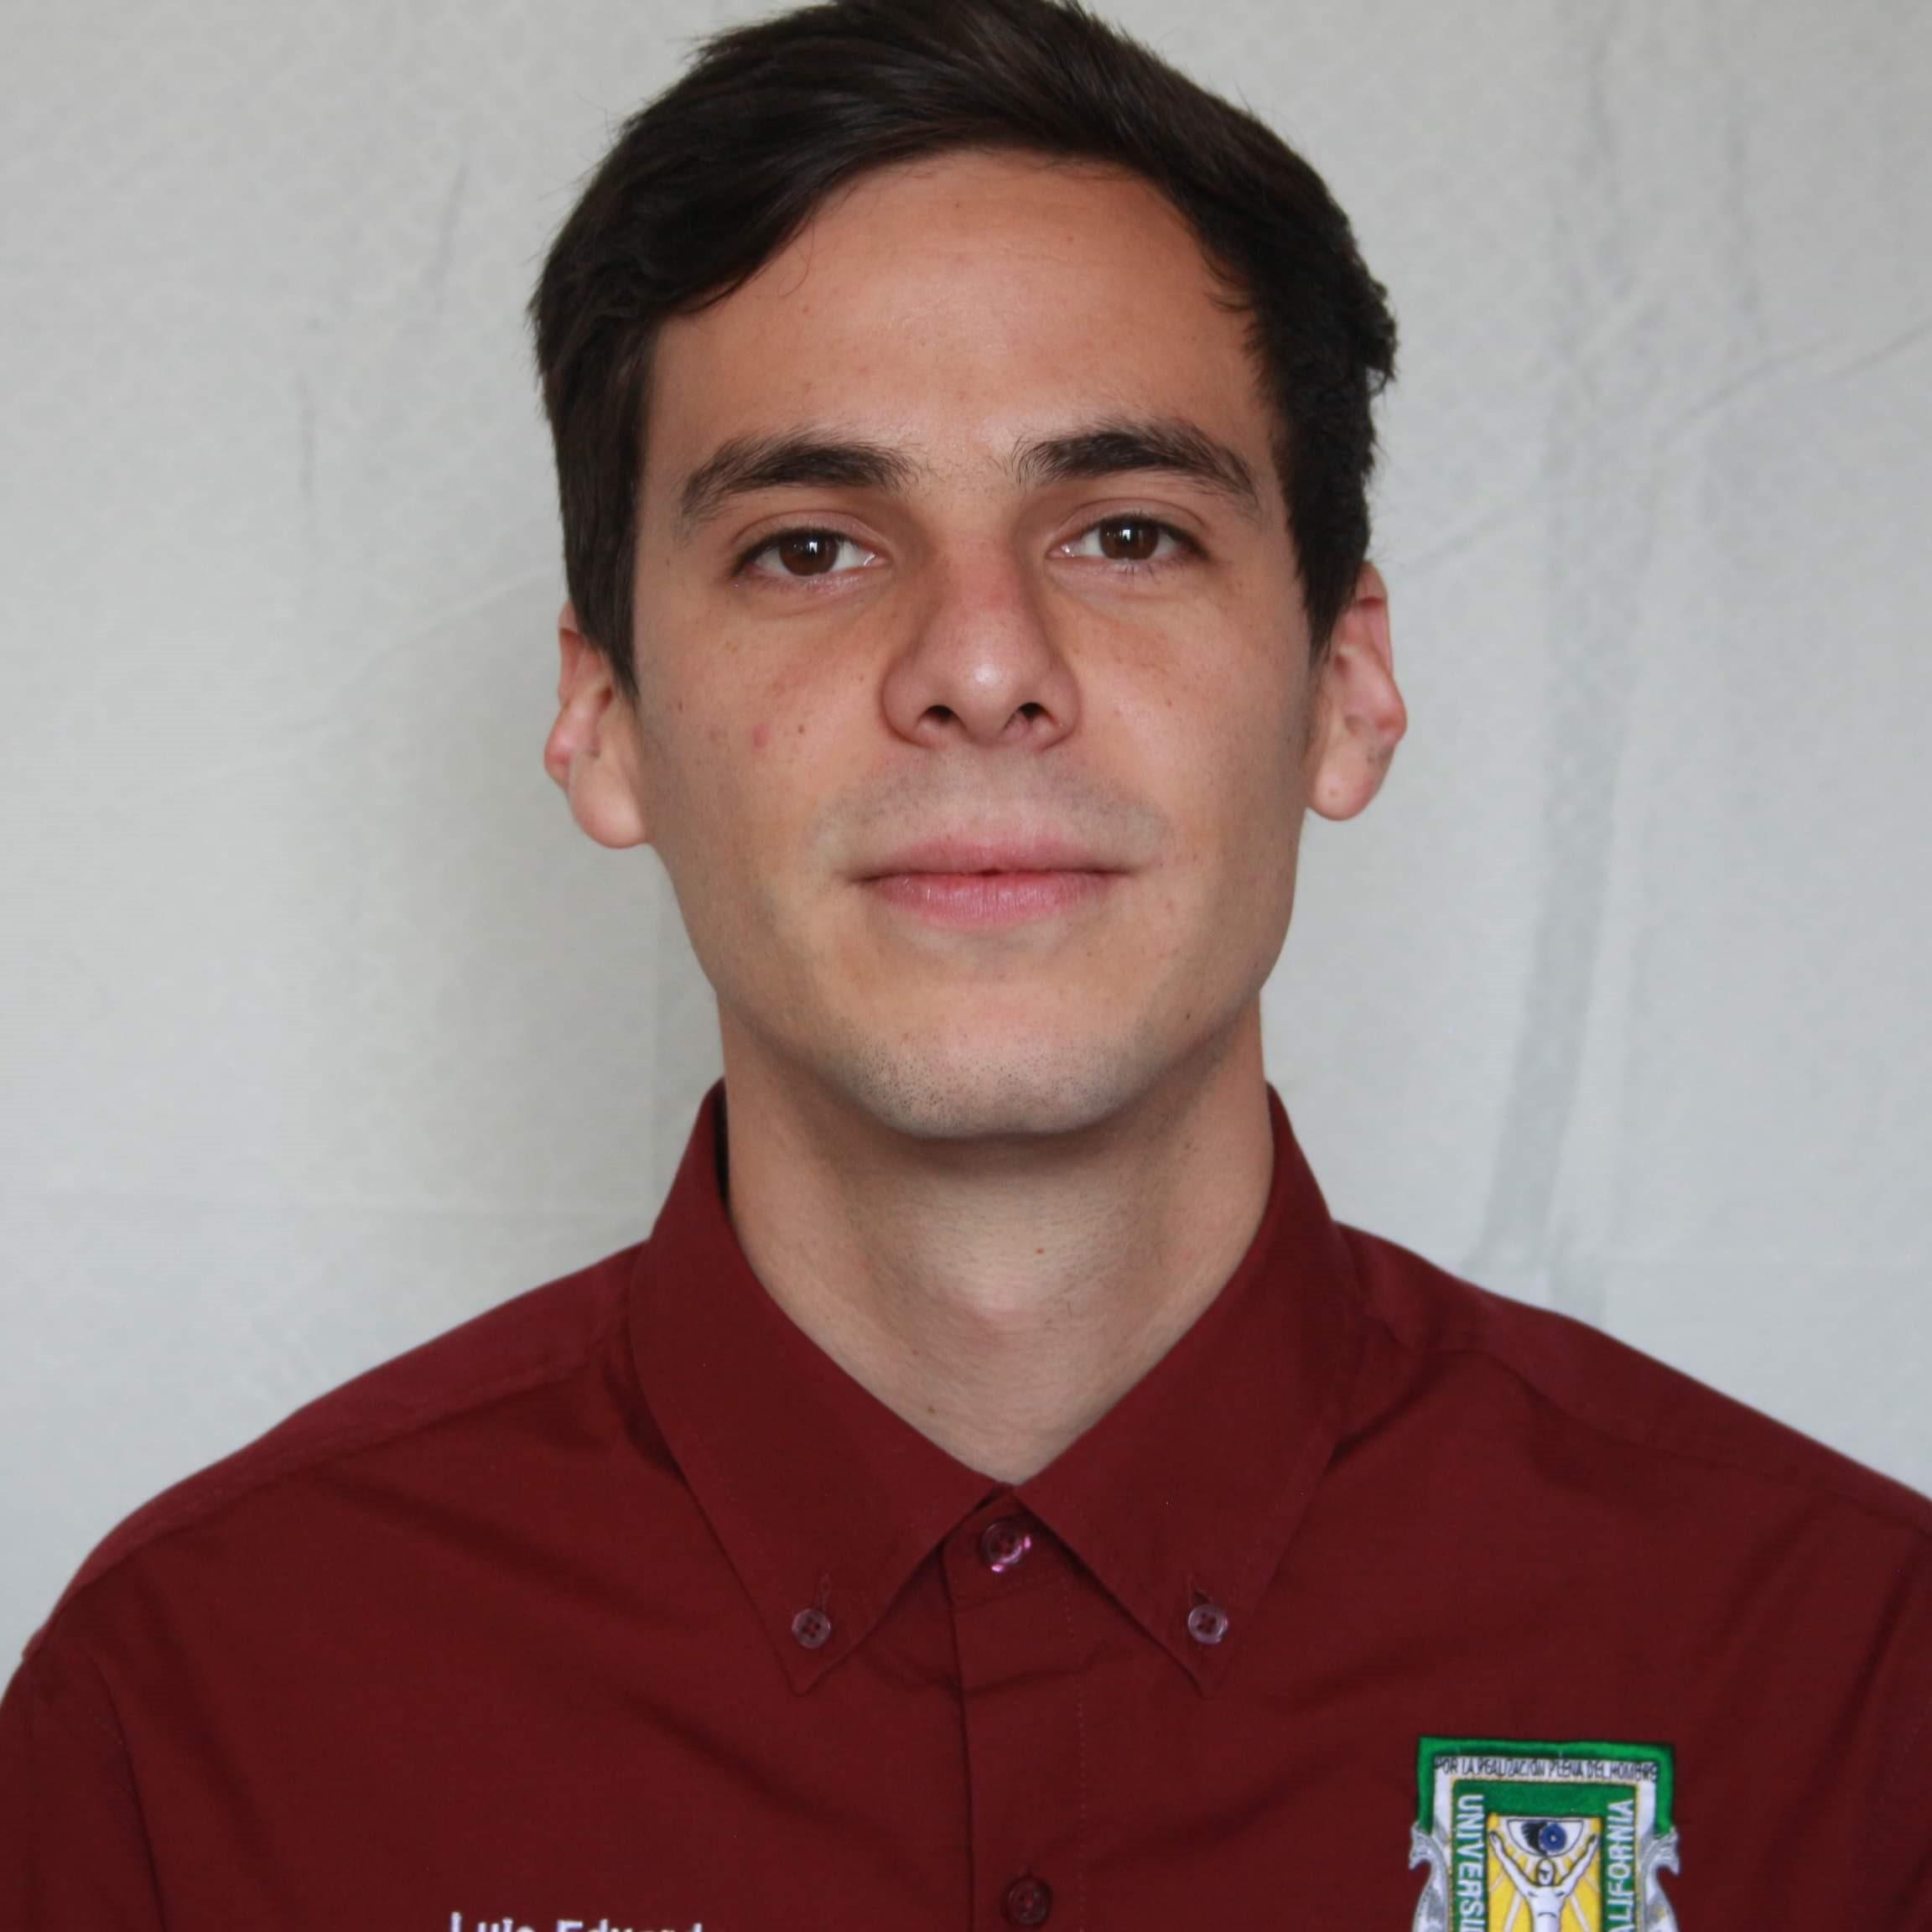 Luis Araiza - sq